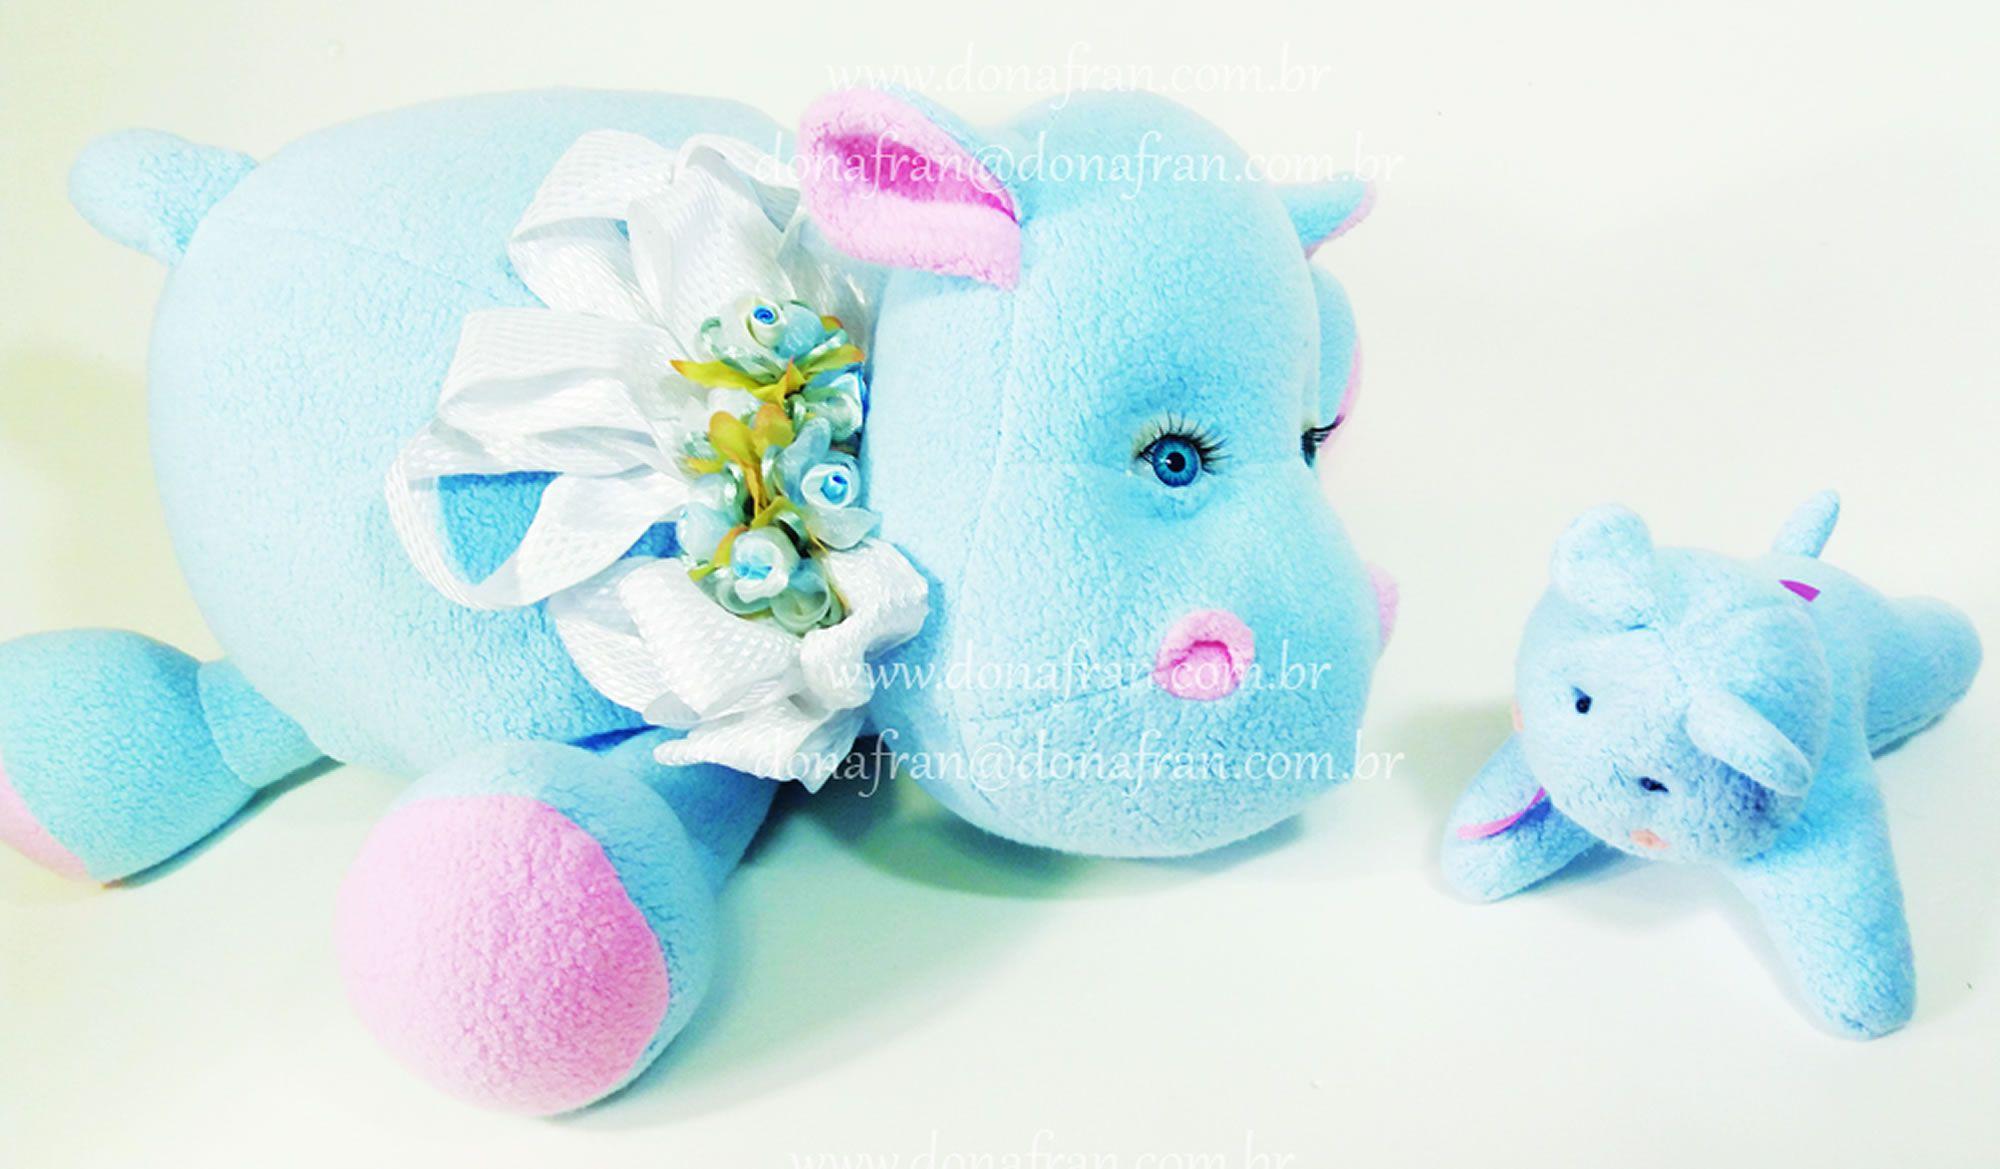 Projeto Hipopótama com Bebê